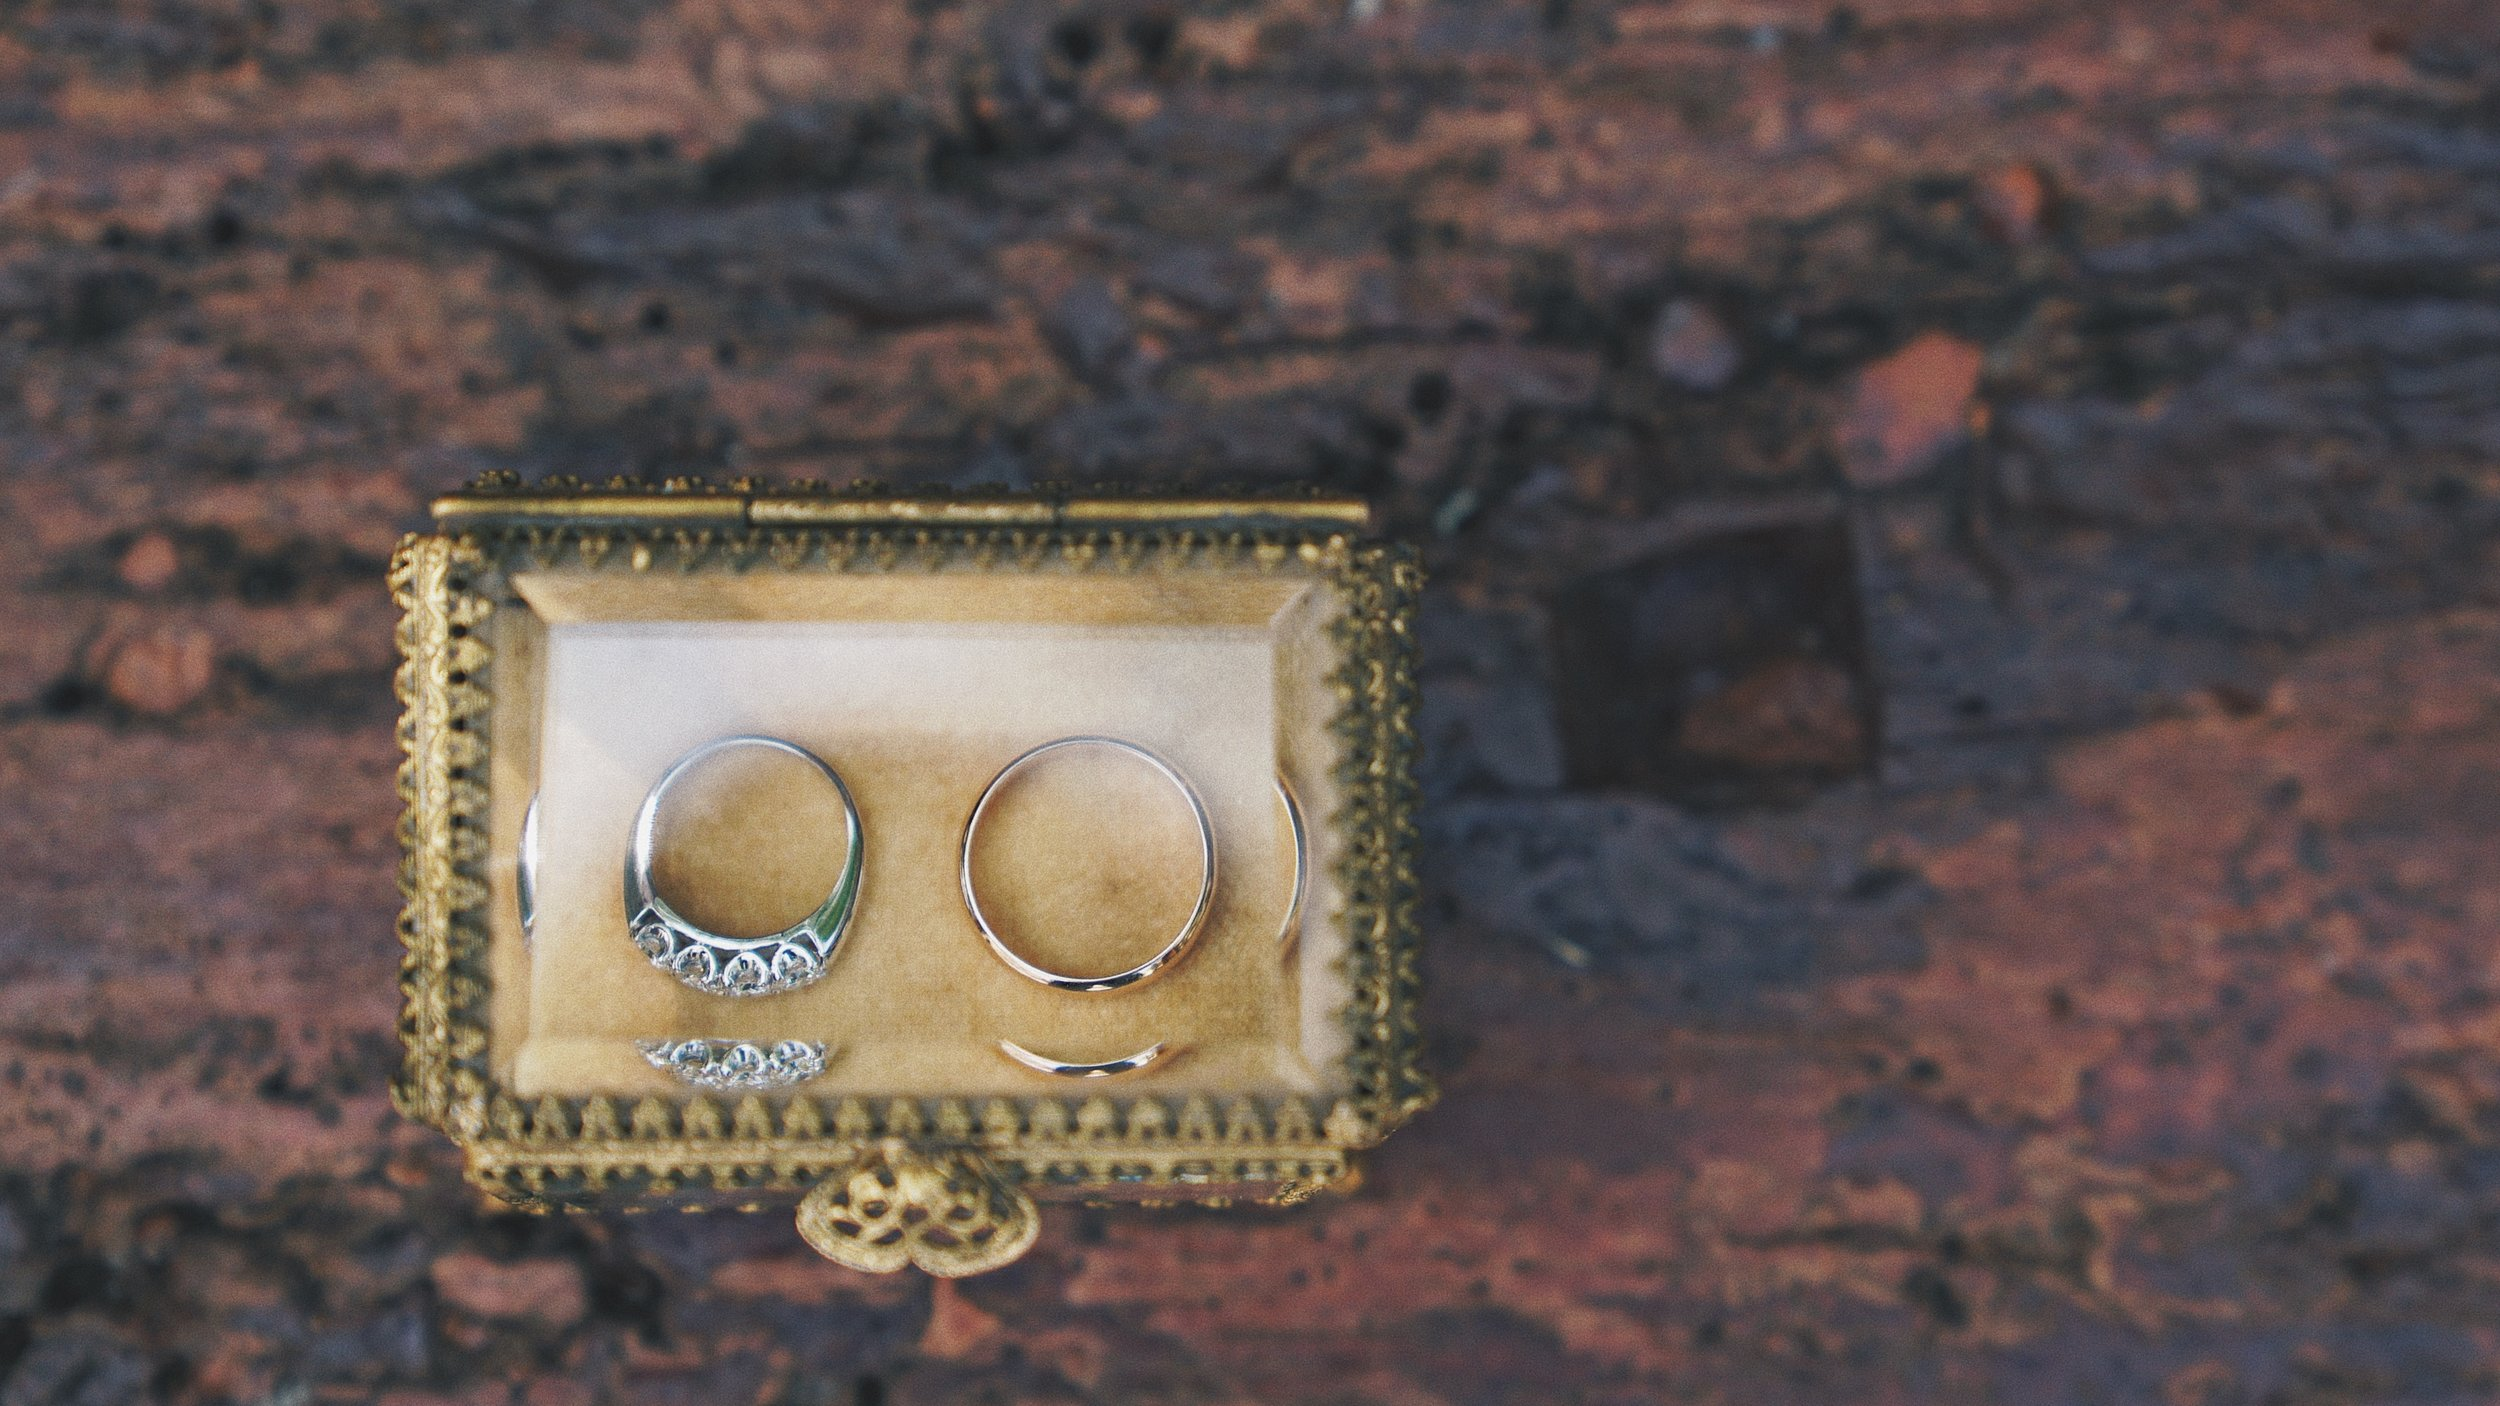 Gorgeous vintage ring box